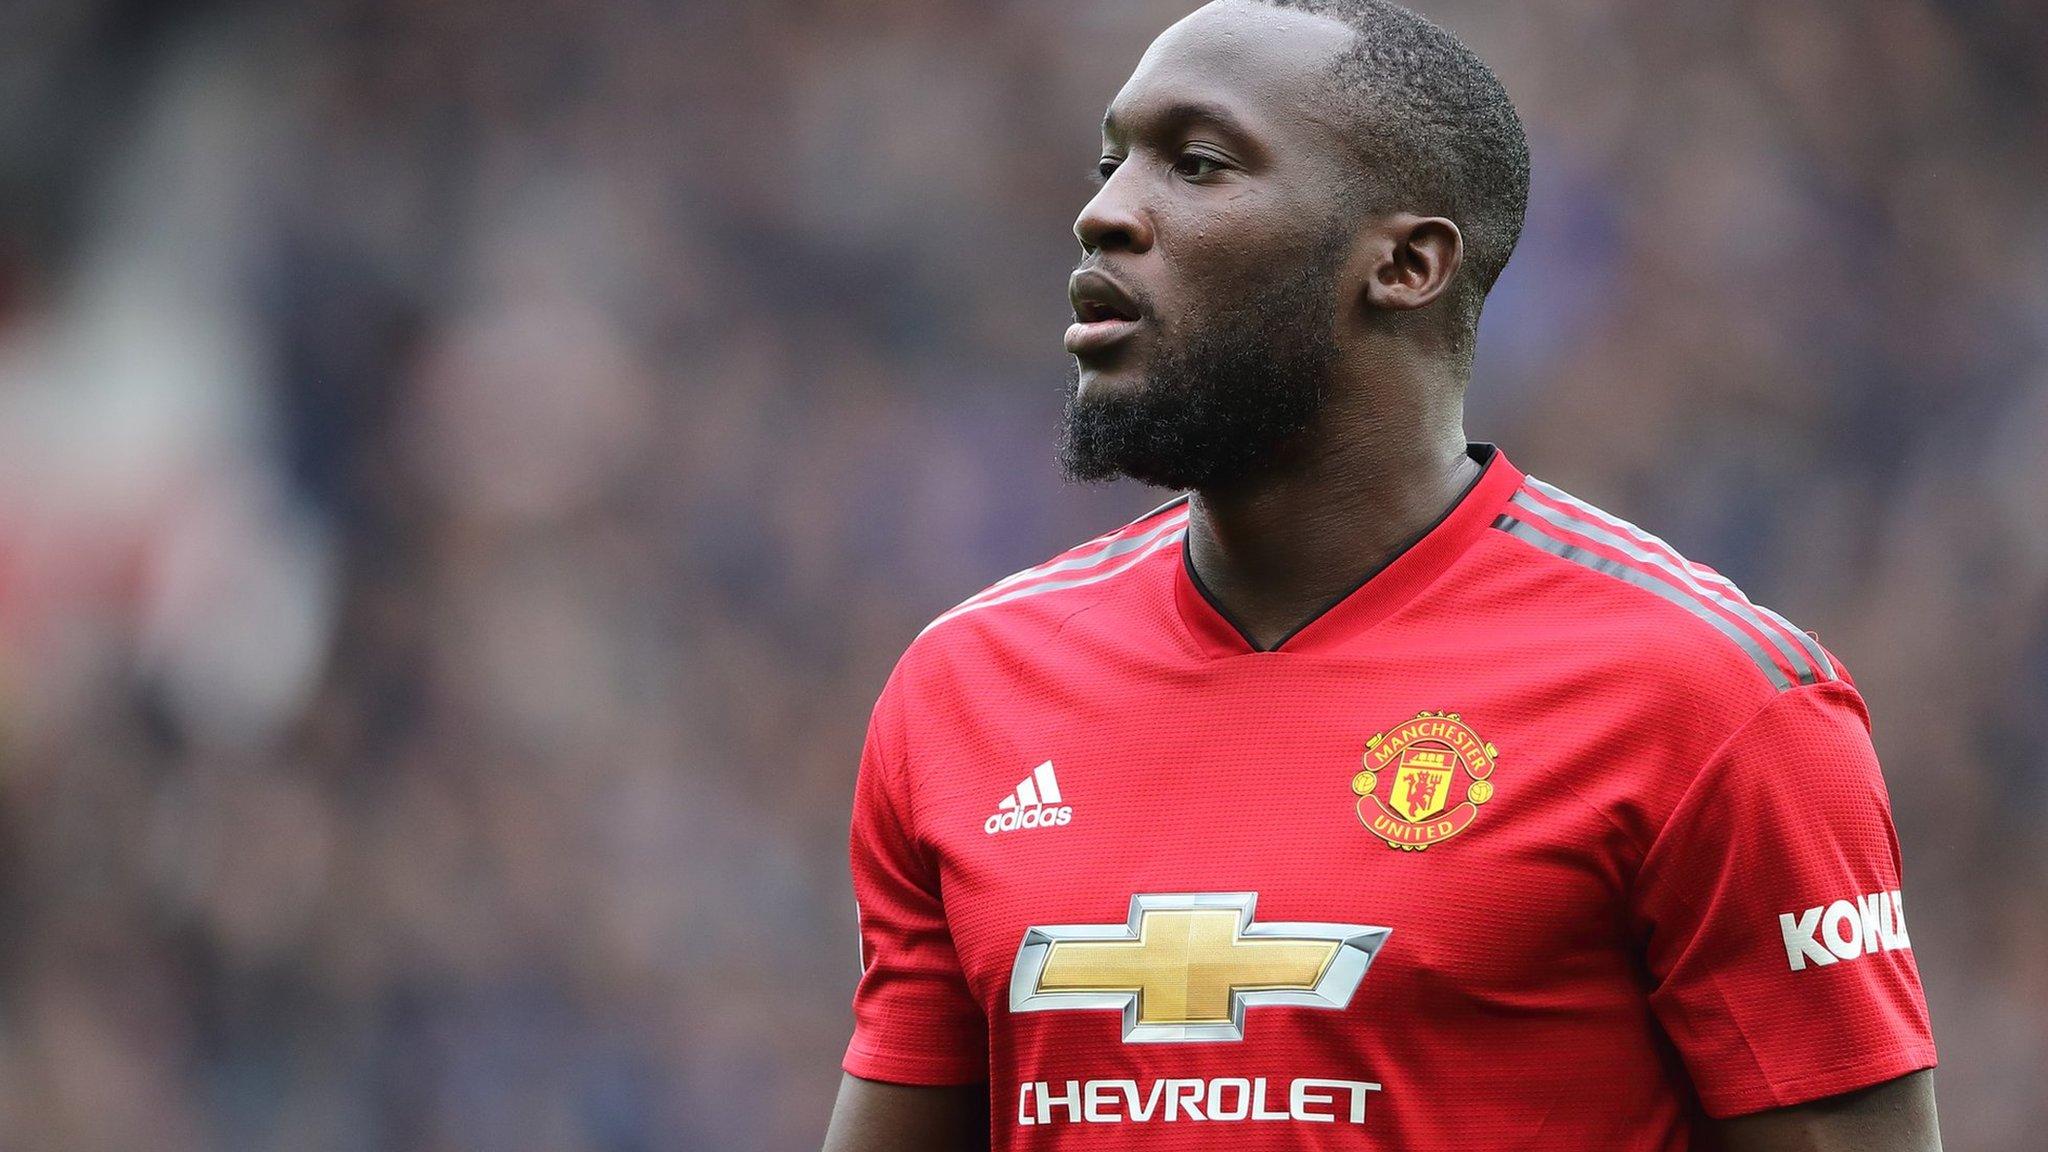 Romelu Lukaku 'has to leave' Man Utd - Roberto Martinez